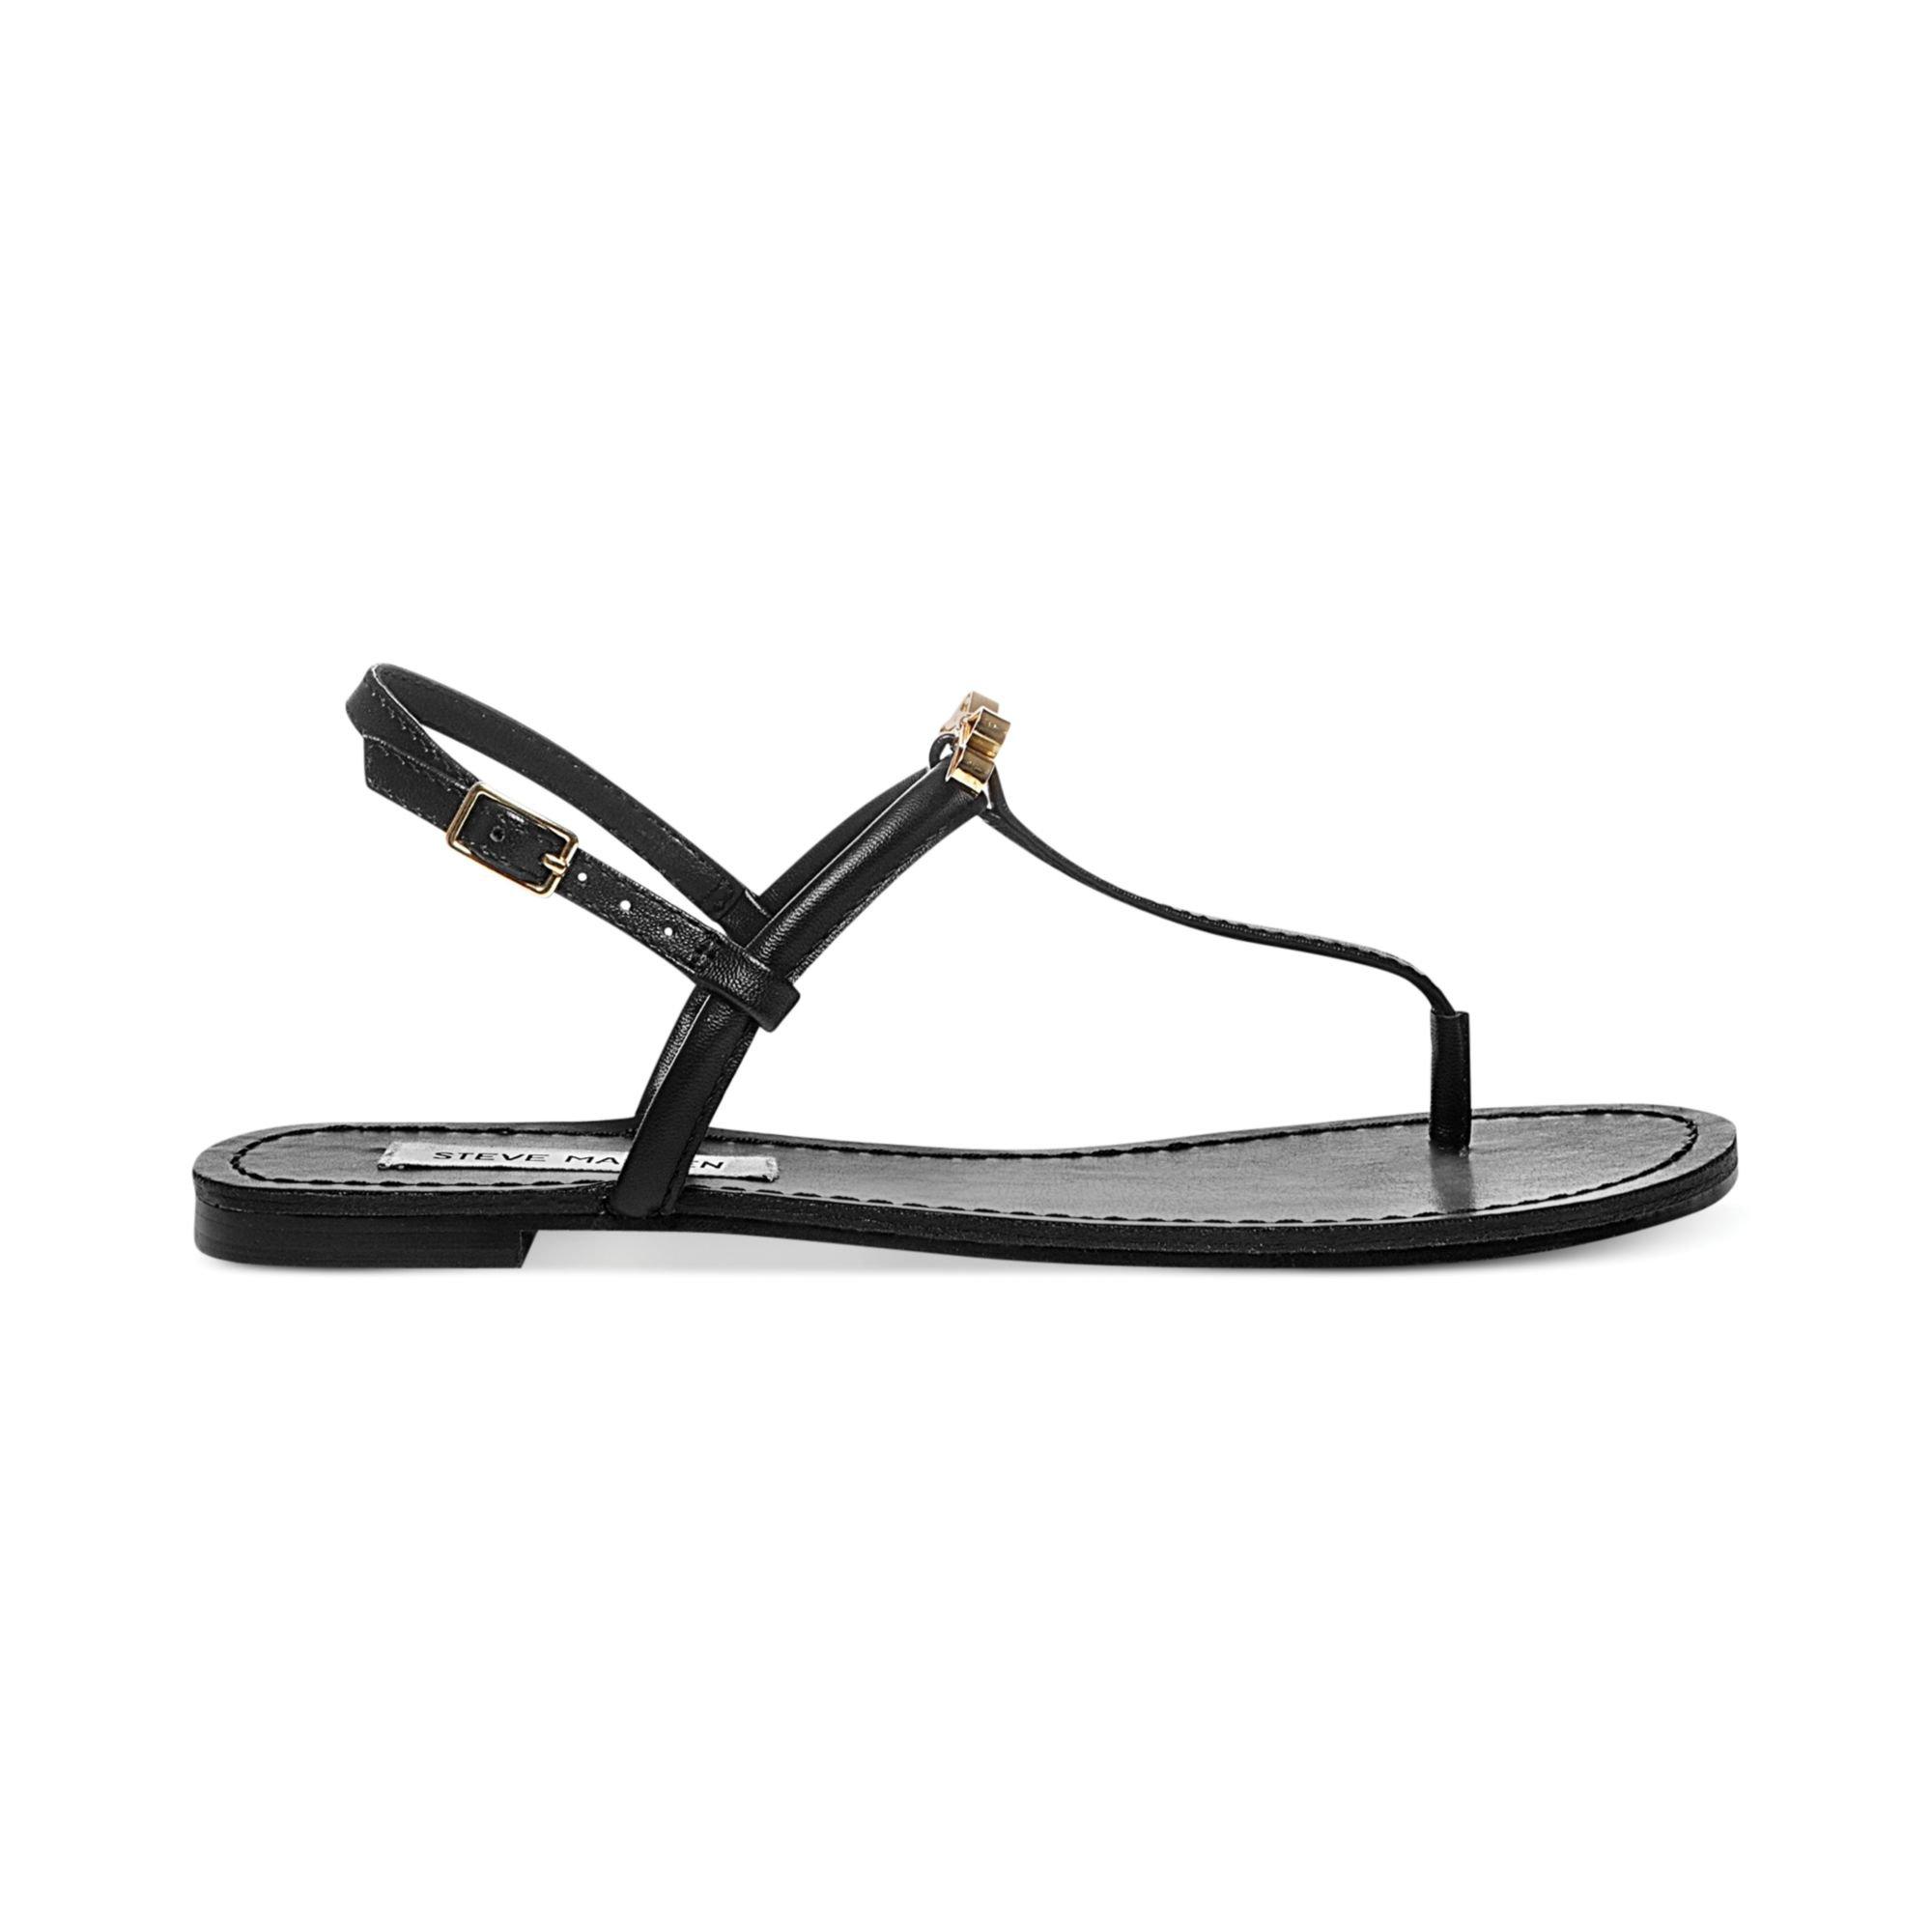 07319336d77cc Lyst - Steve Madden Womens Daisey Flat Thong Sandals in Black